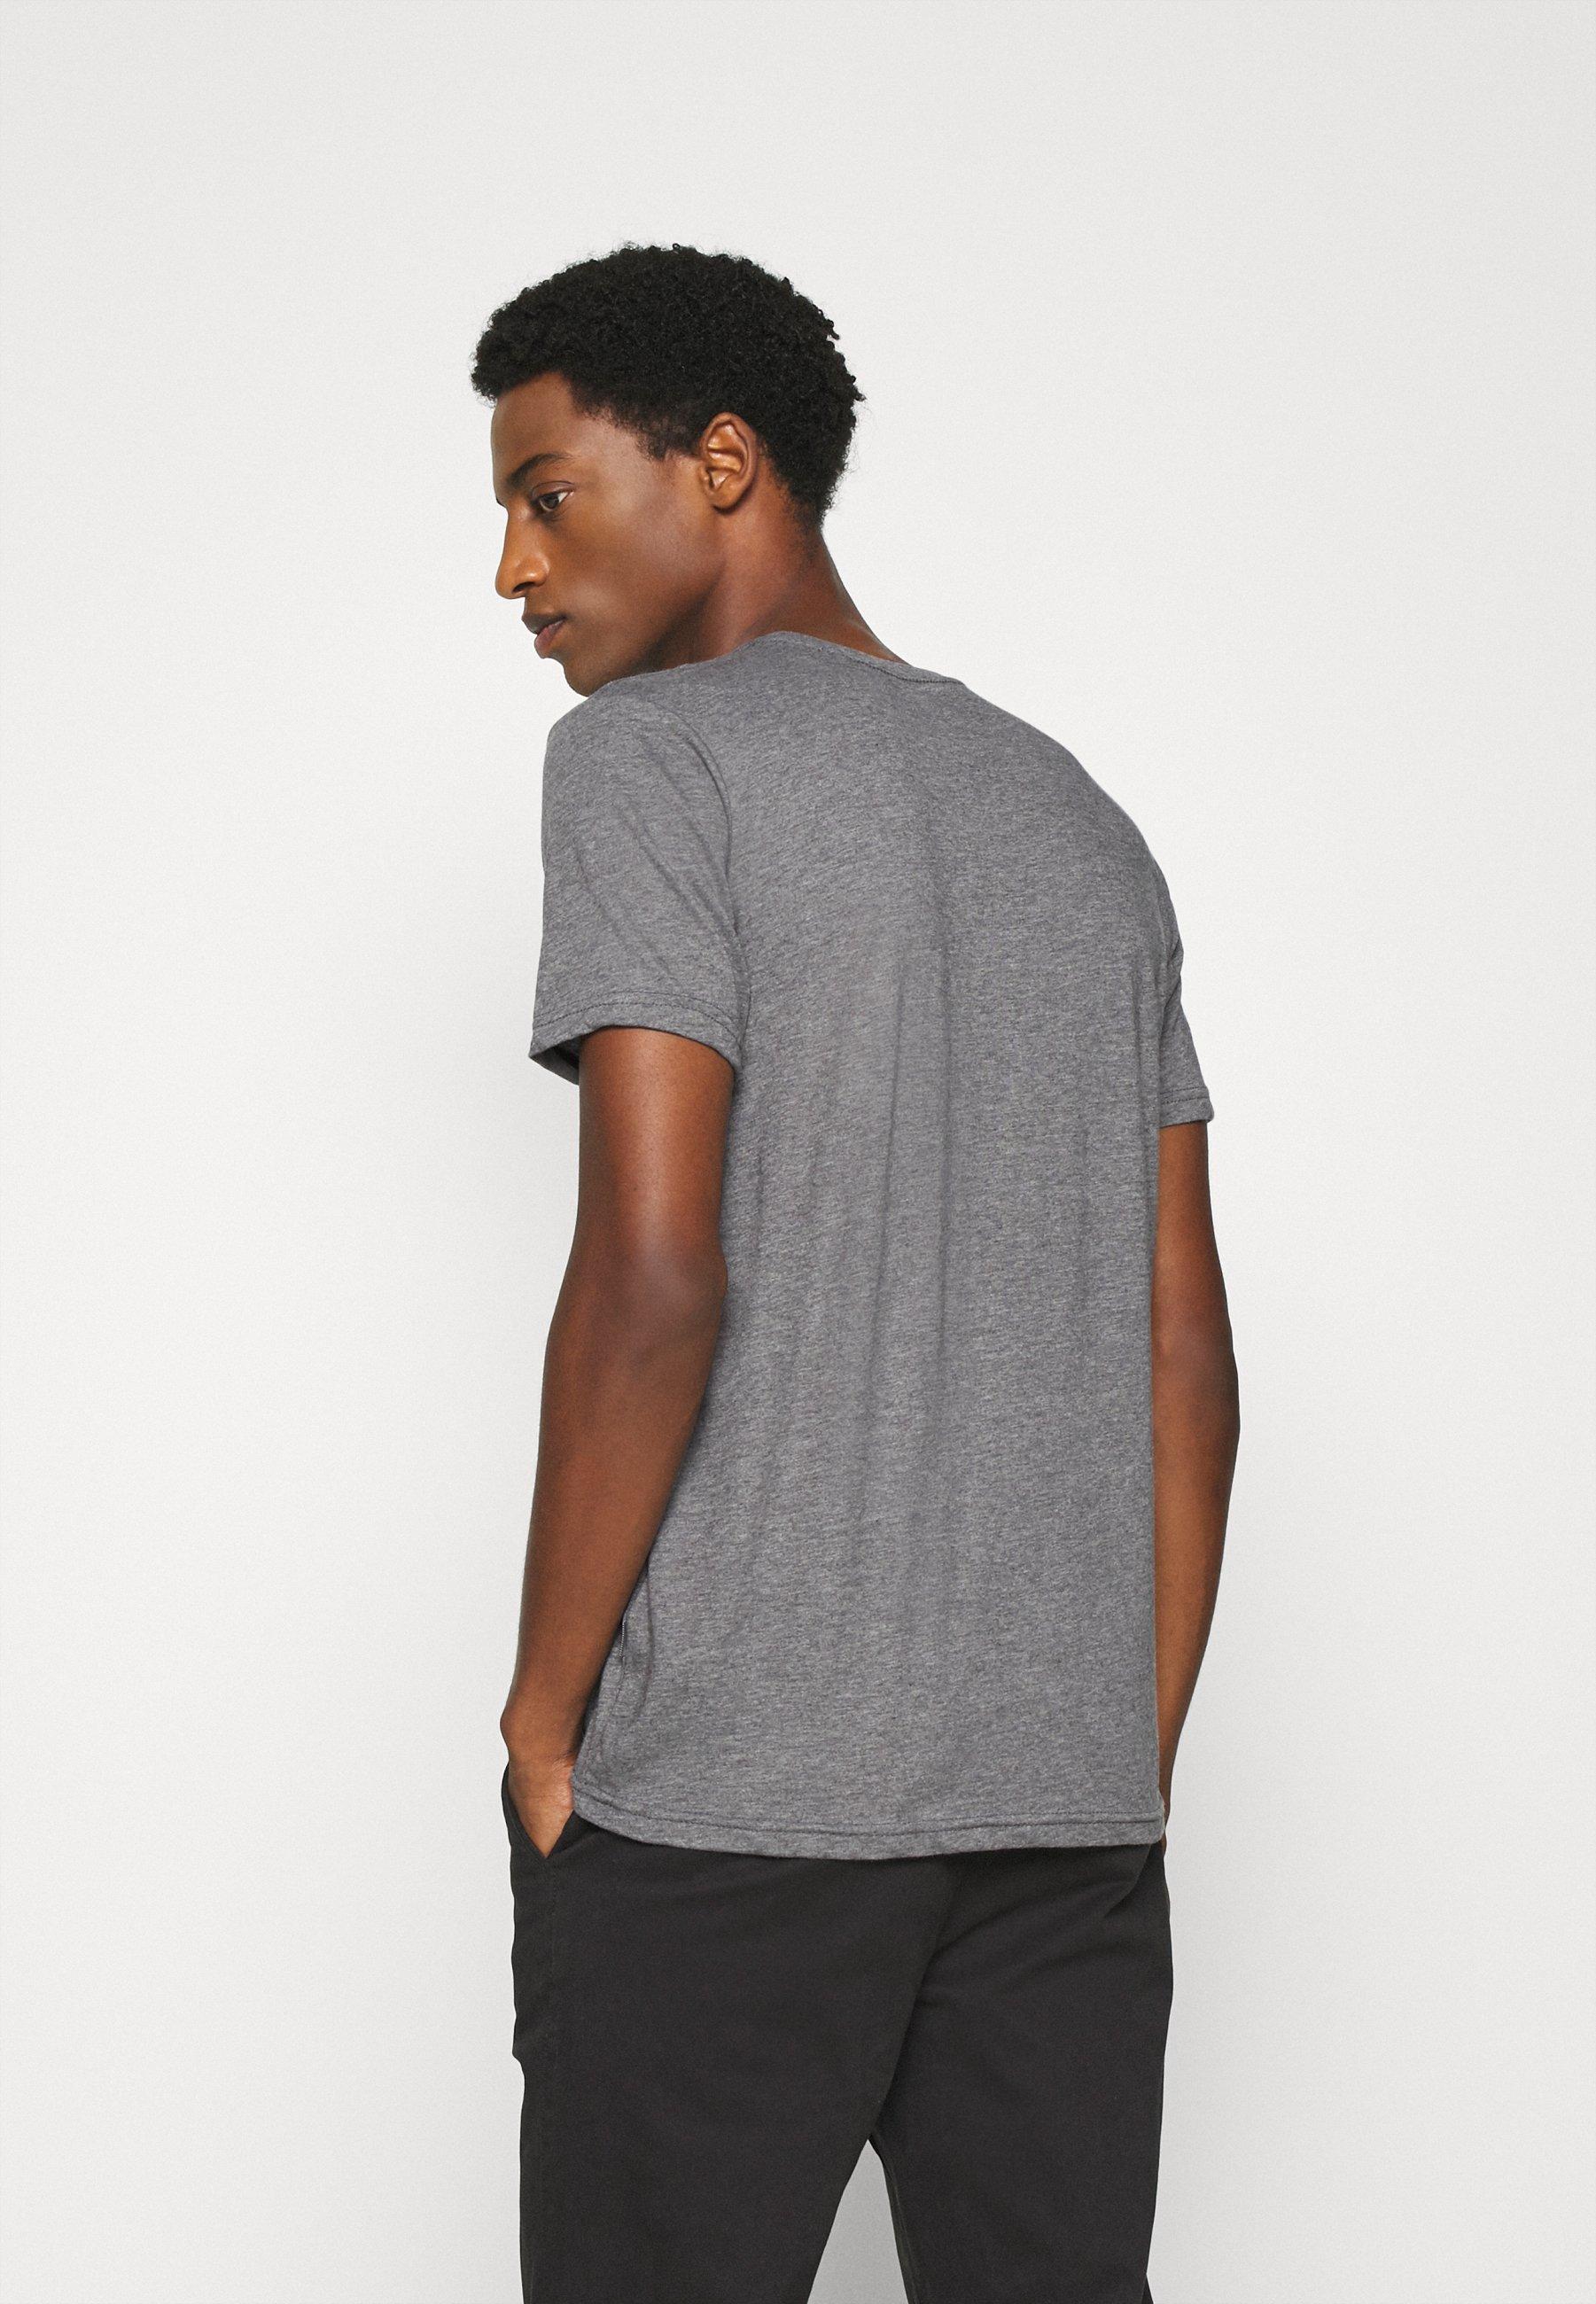 Solid Print T-shirt - grey melange r2i4X